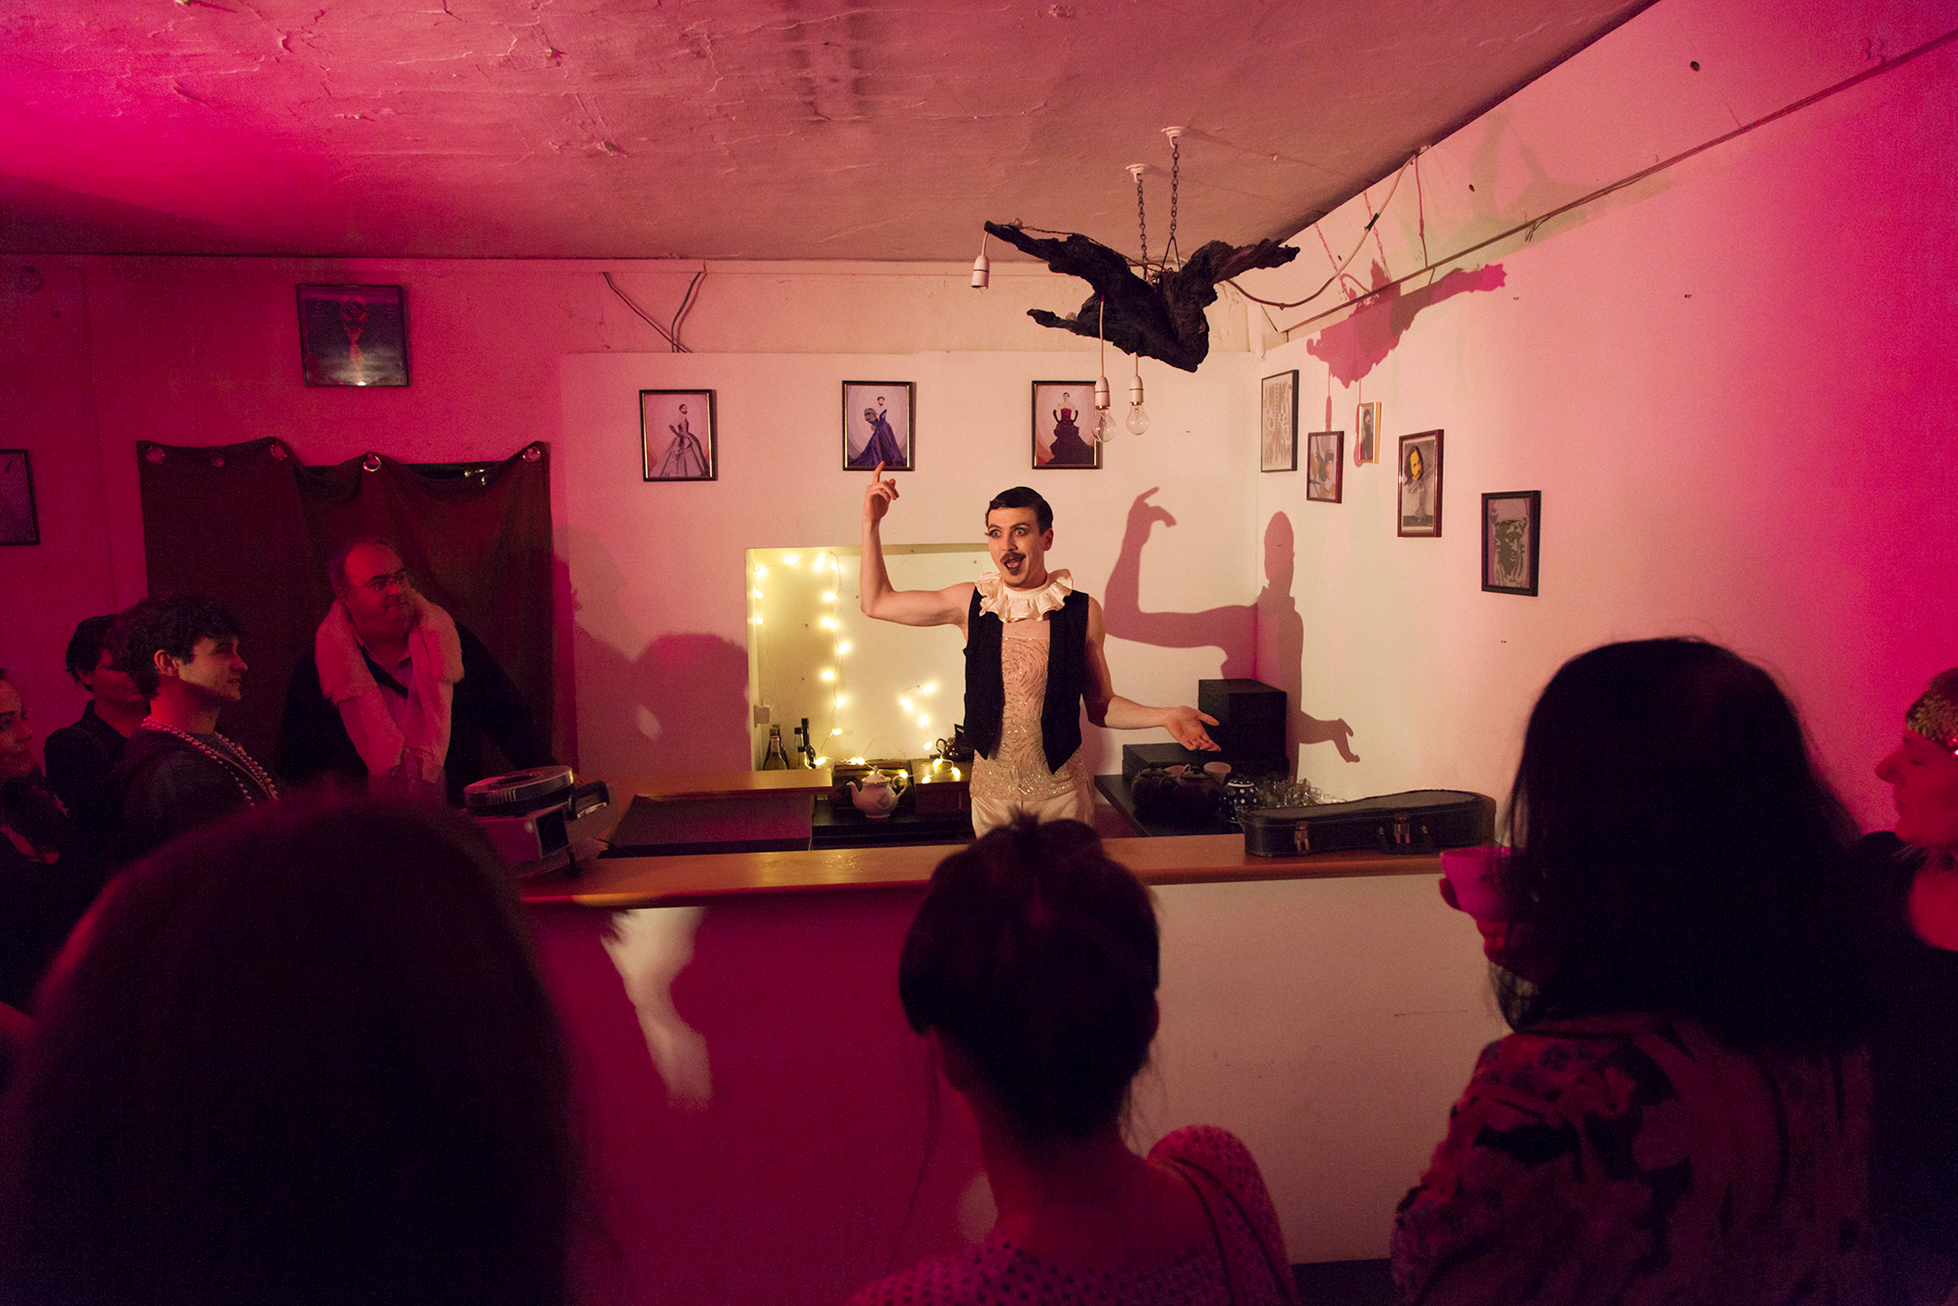 cabaretmattachine_productionphotos_lowres-2.jpg